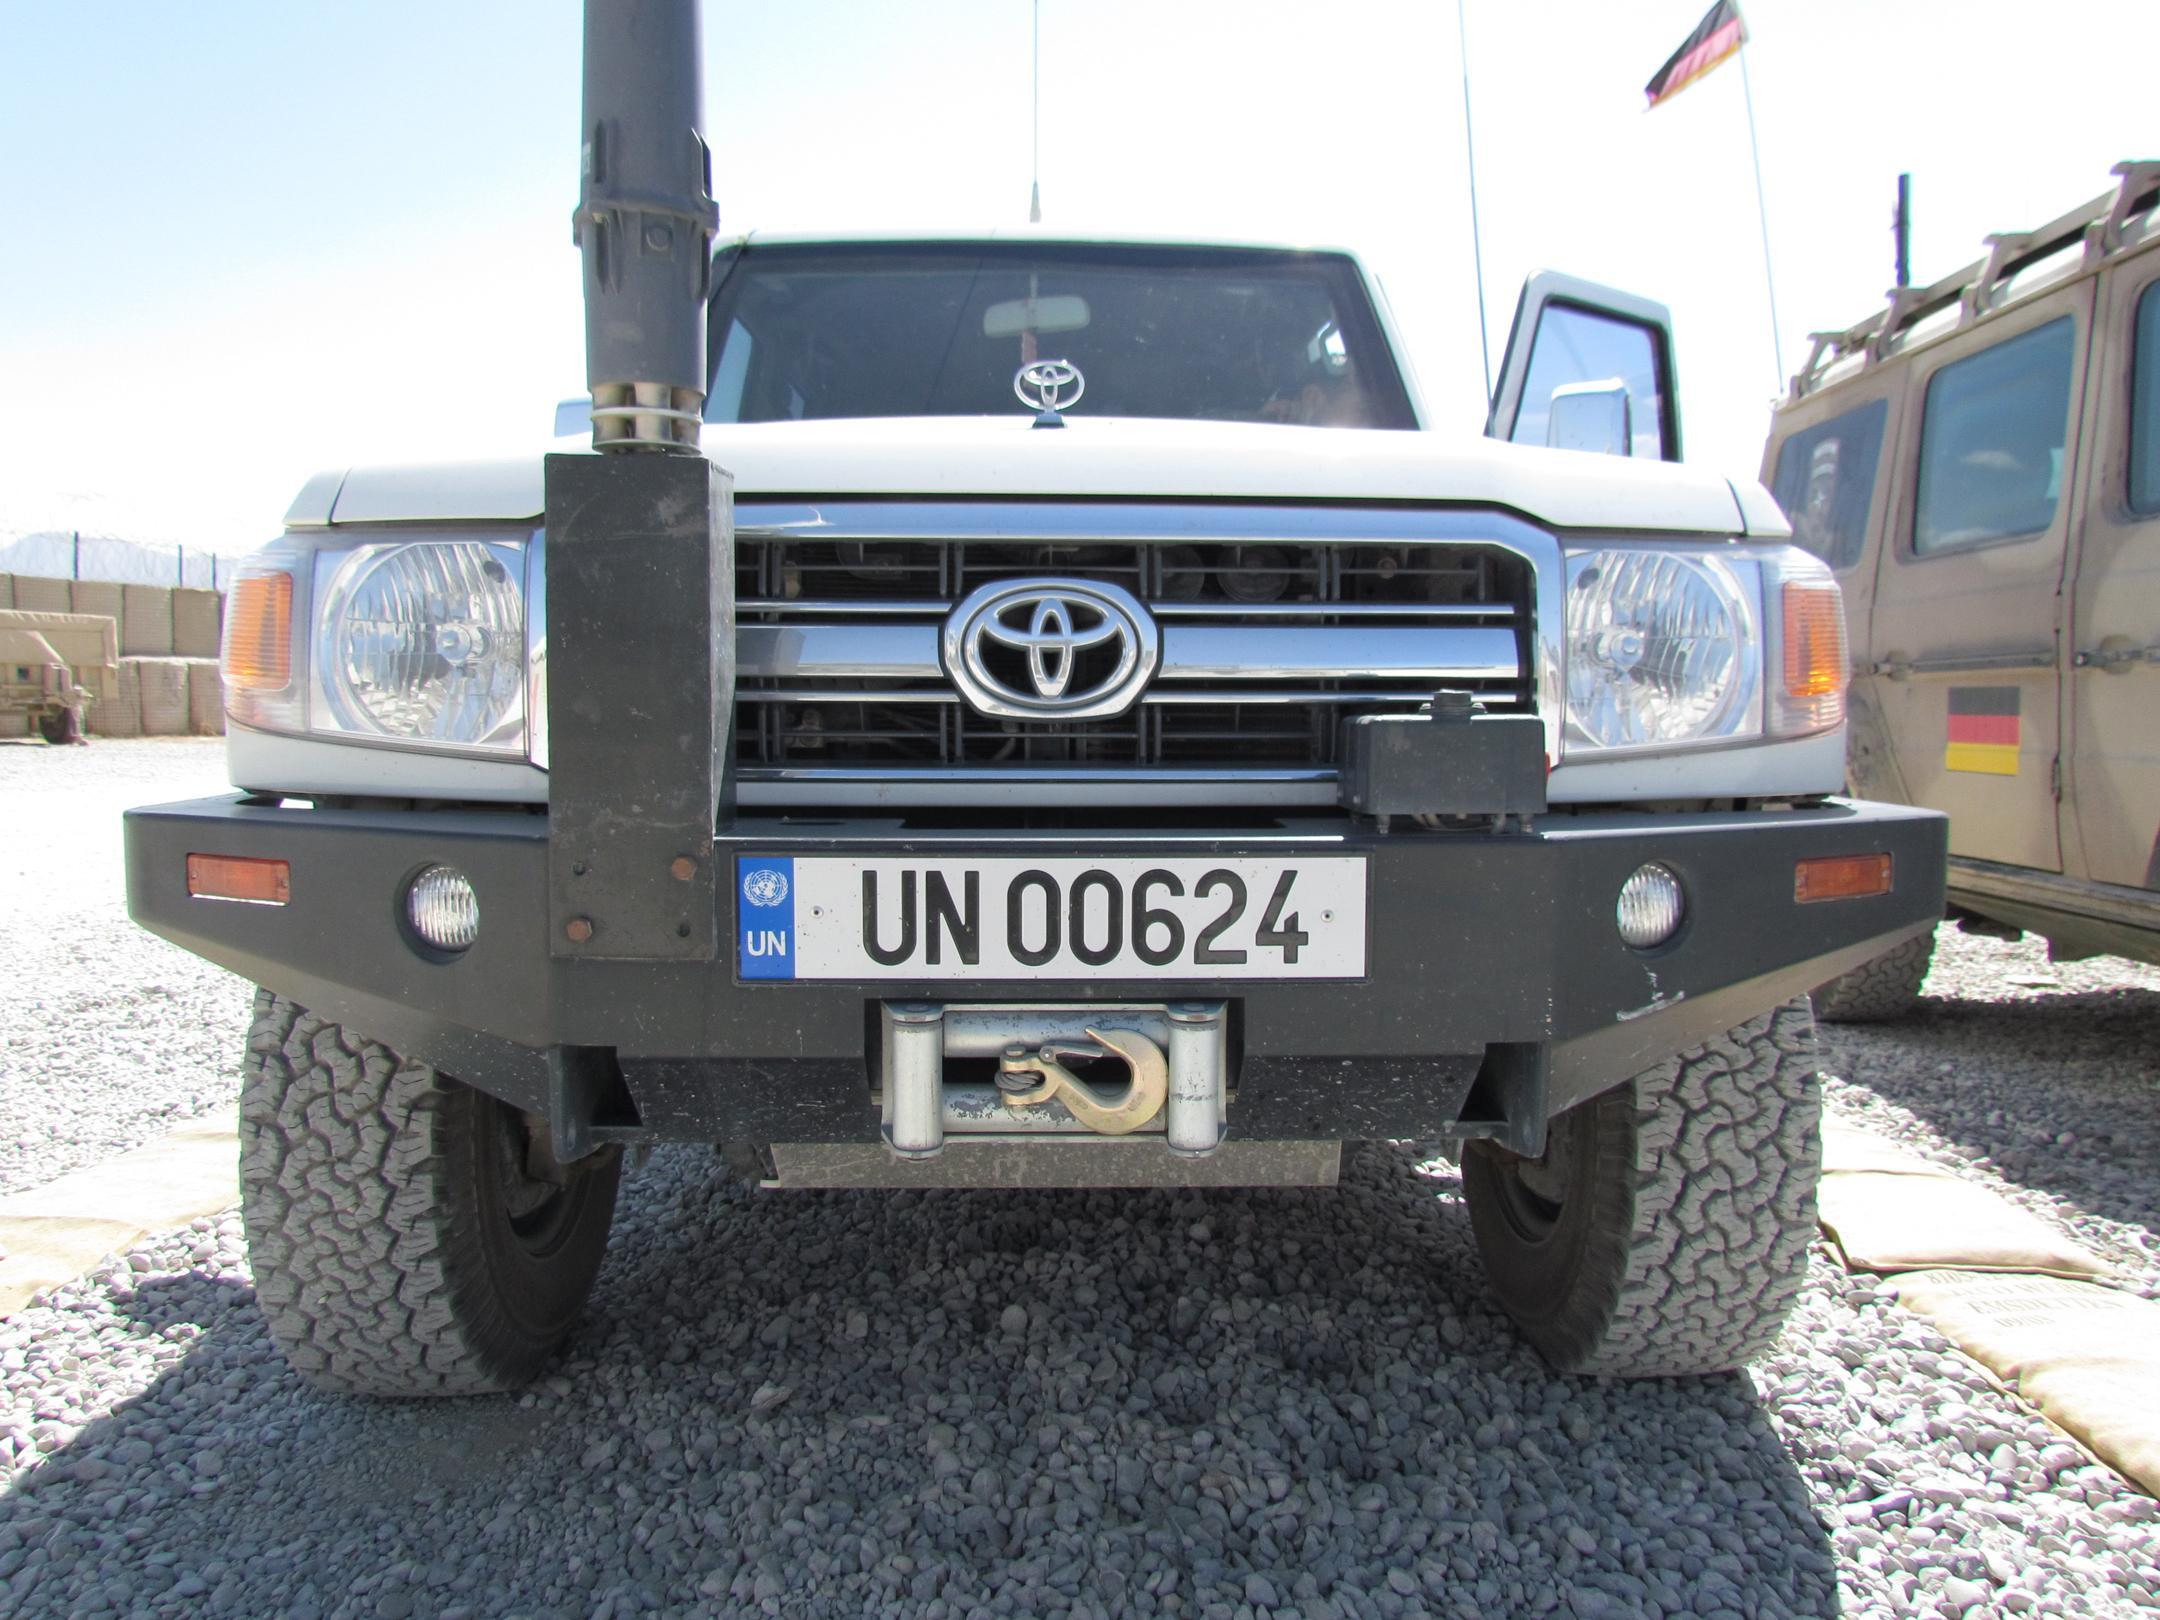 United Nations Y2k